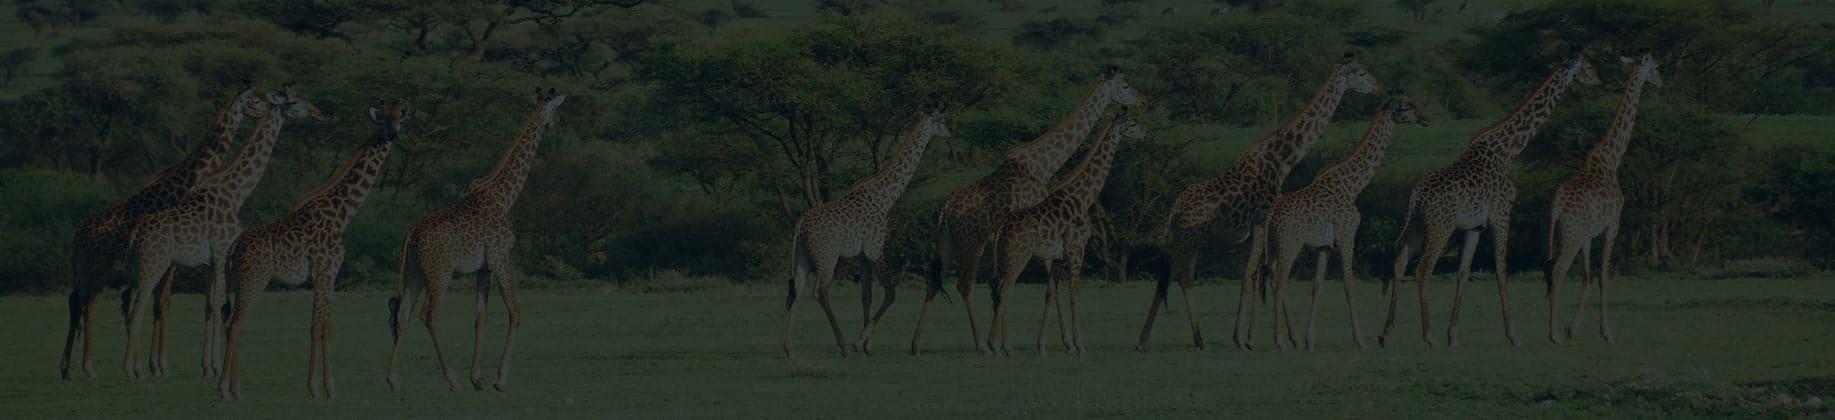 Ochrona bioróżnorodności (3L)